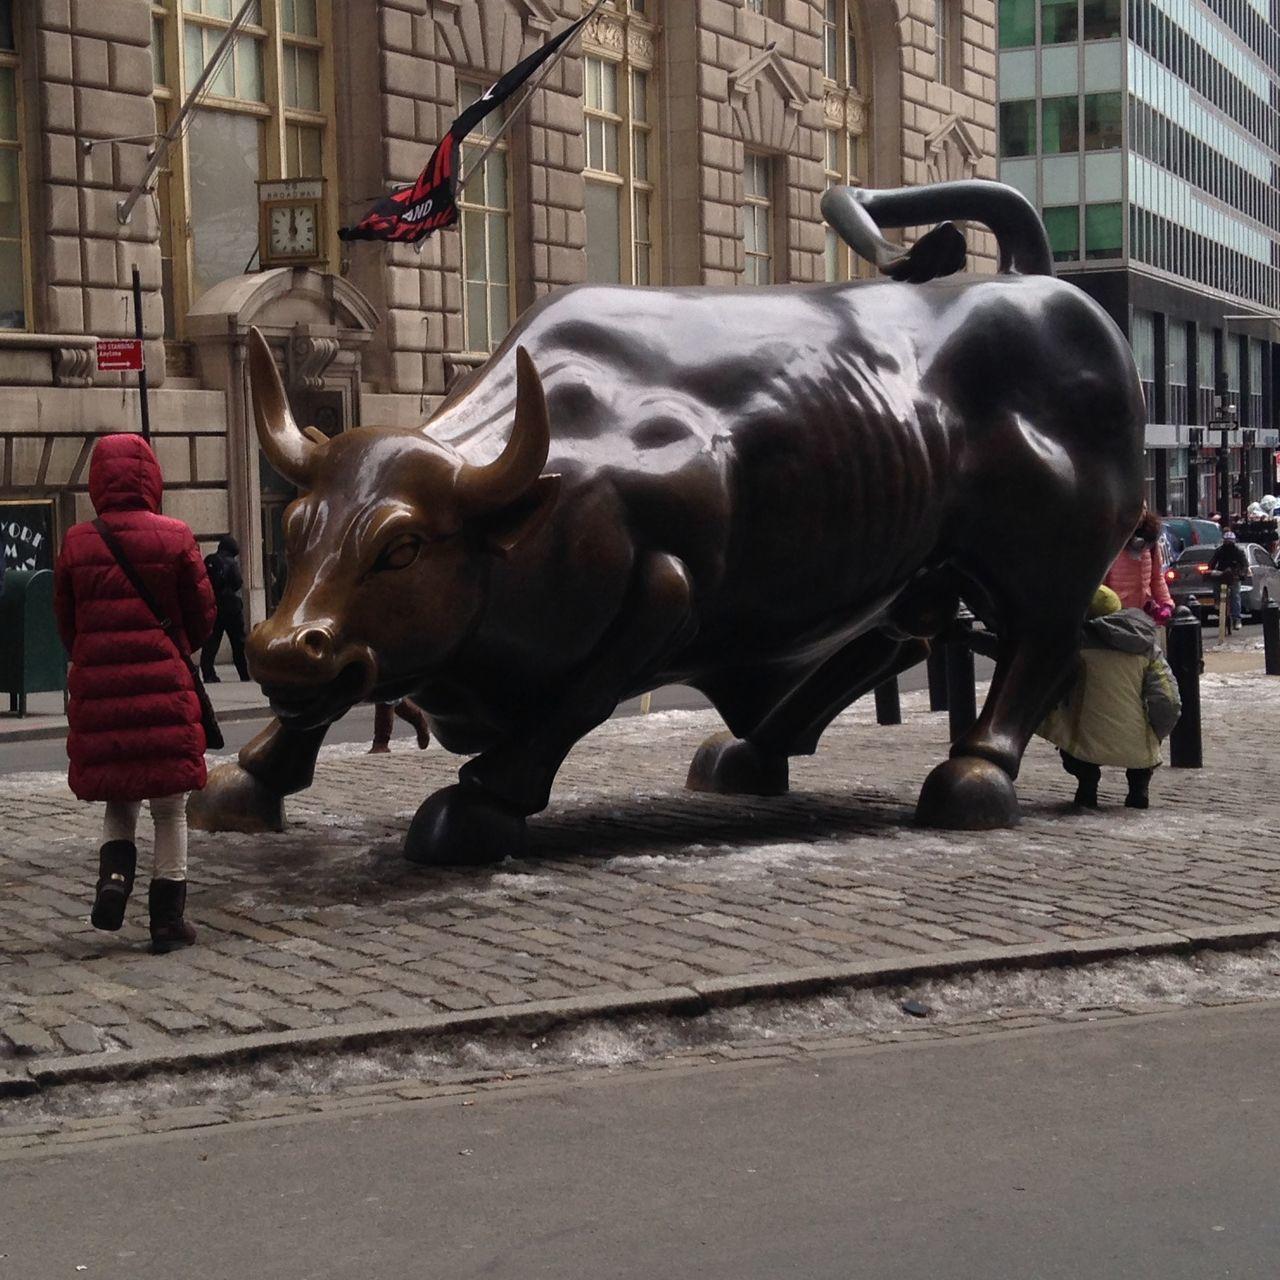 Beautiful stock photos of stock exchange, Animal Representation, Animal Themes, Animals Charging, Architecture